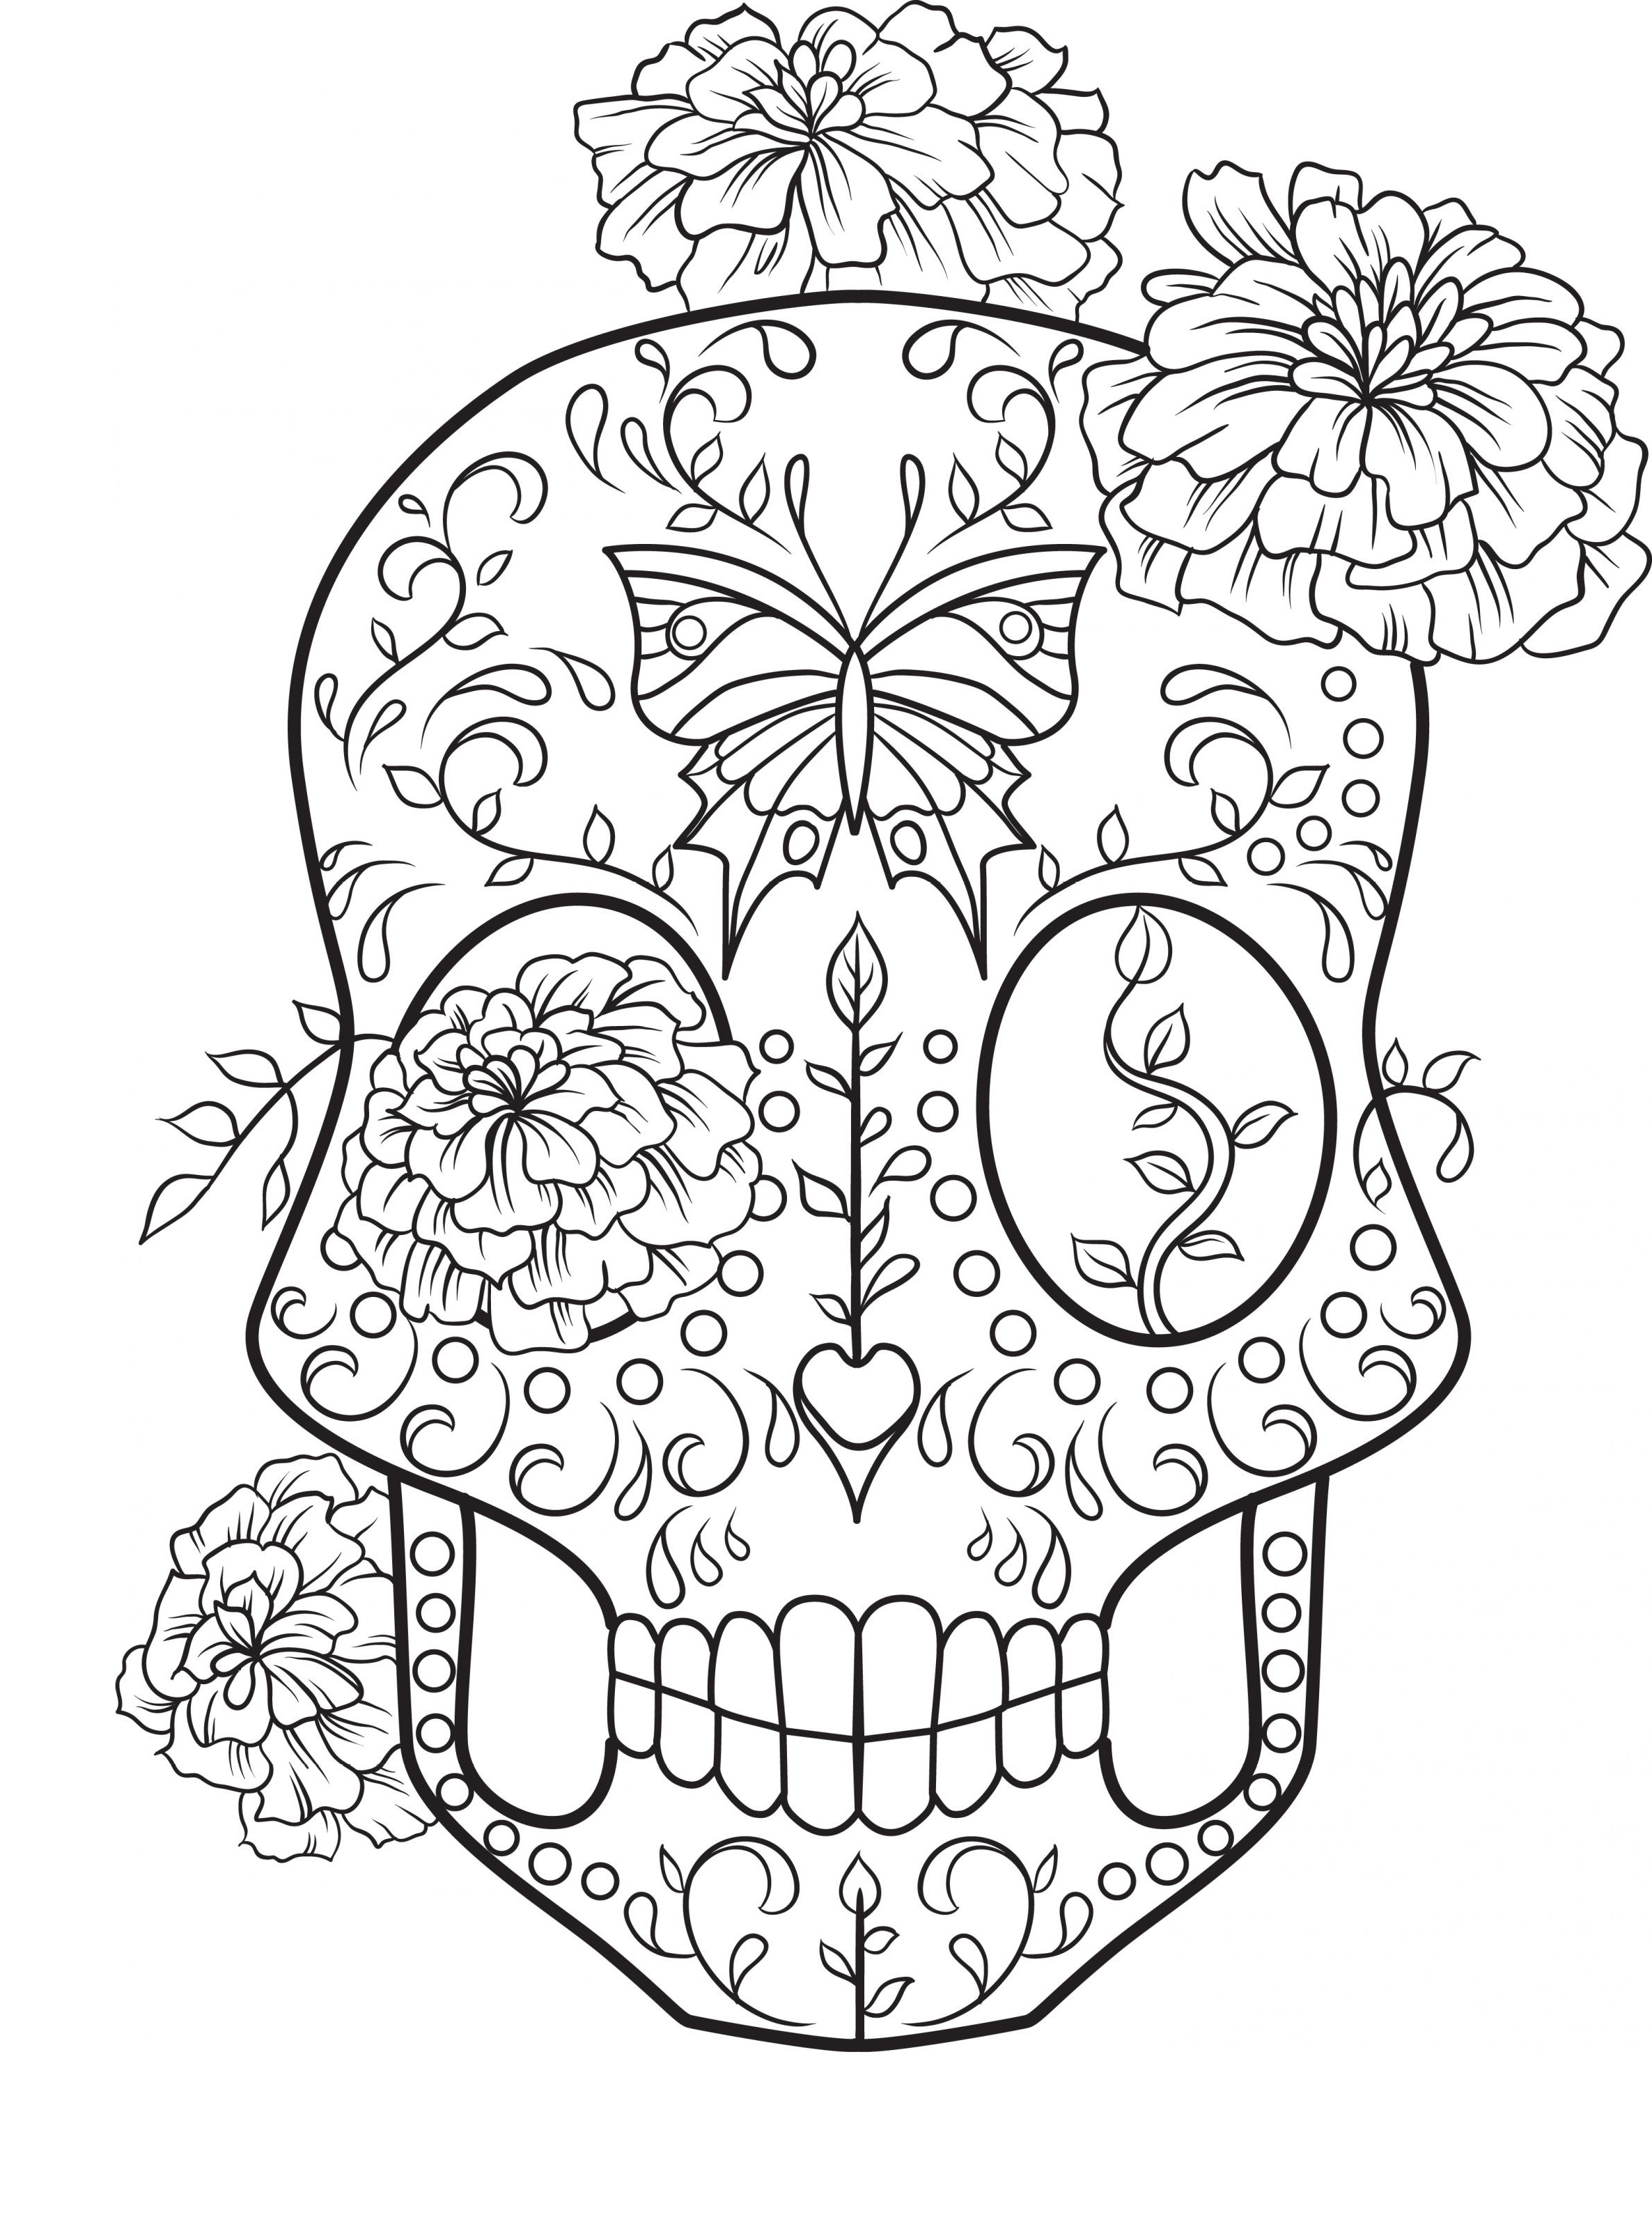 - Sugar Skull Coloring Page - Coloring Home